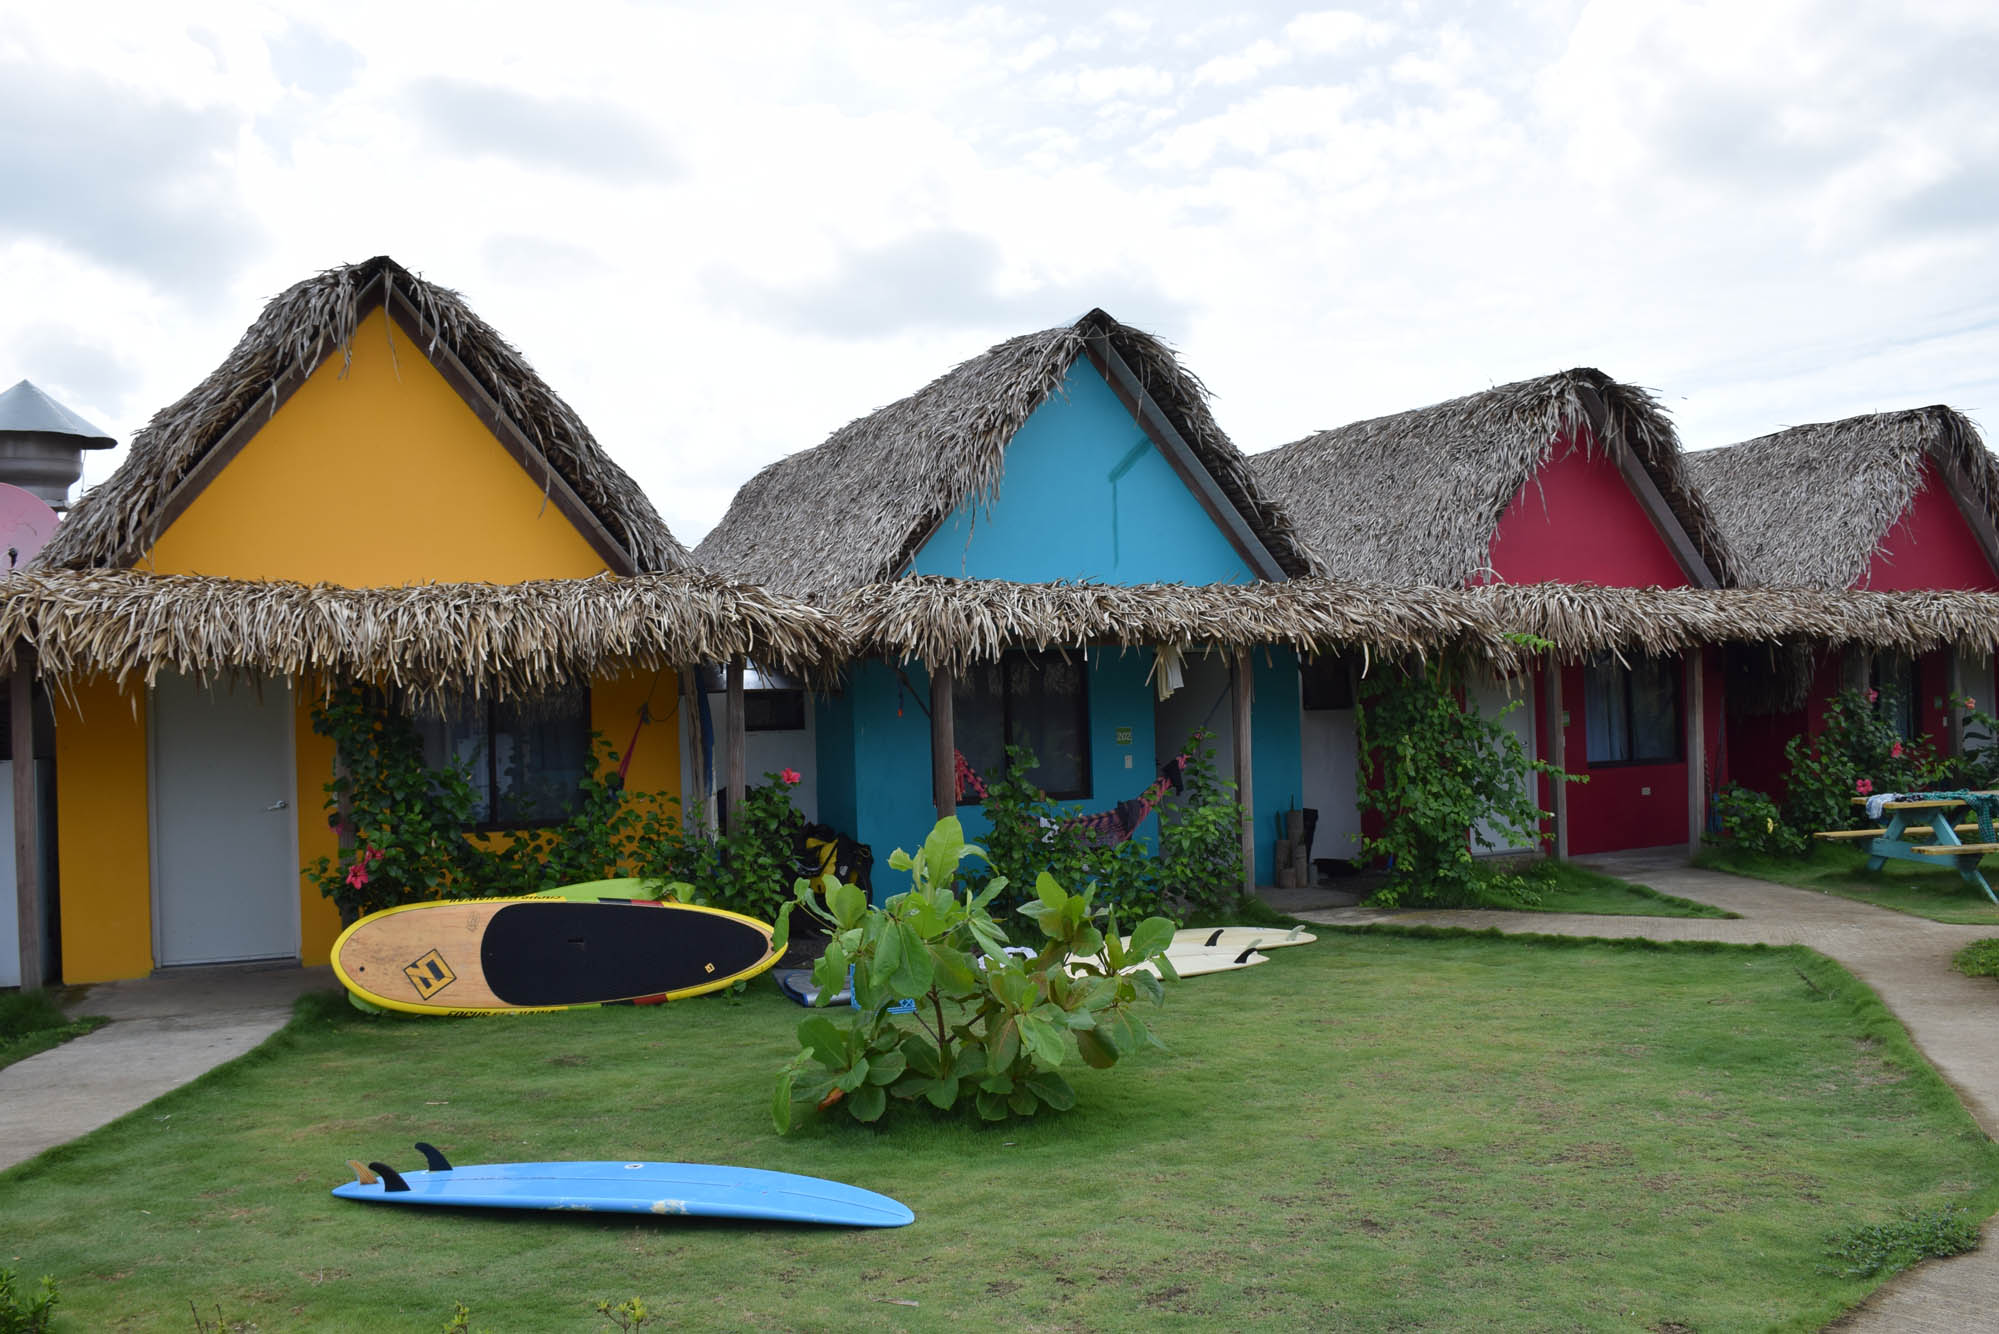 Pedasi-Isla-Iguana-Panama-Andromeda-Playa-Venao-LalaRebelo_0457